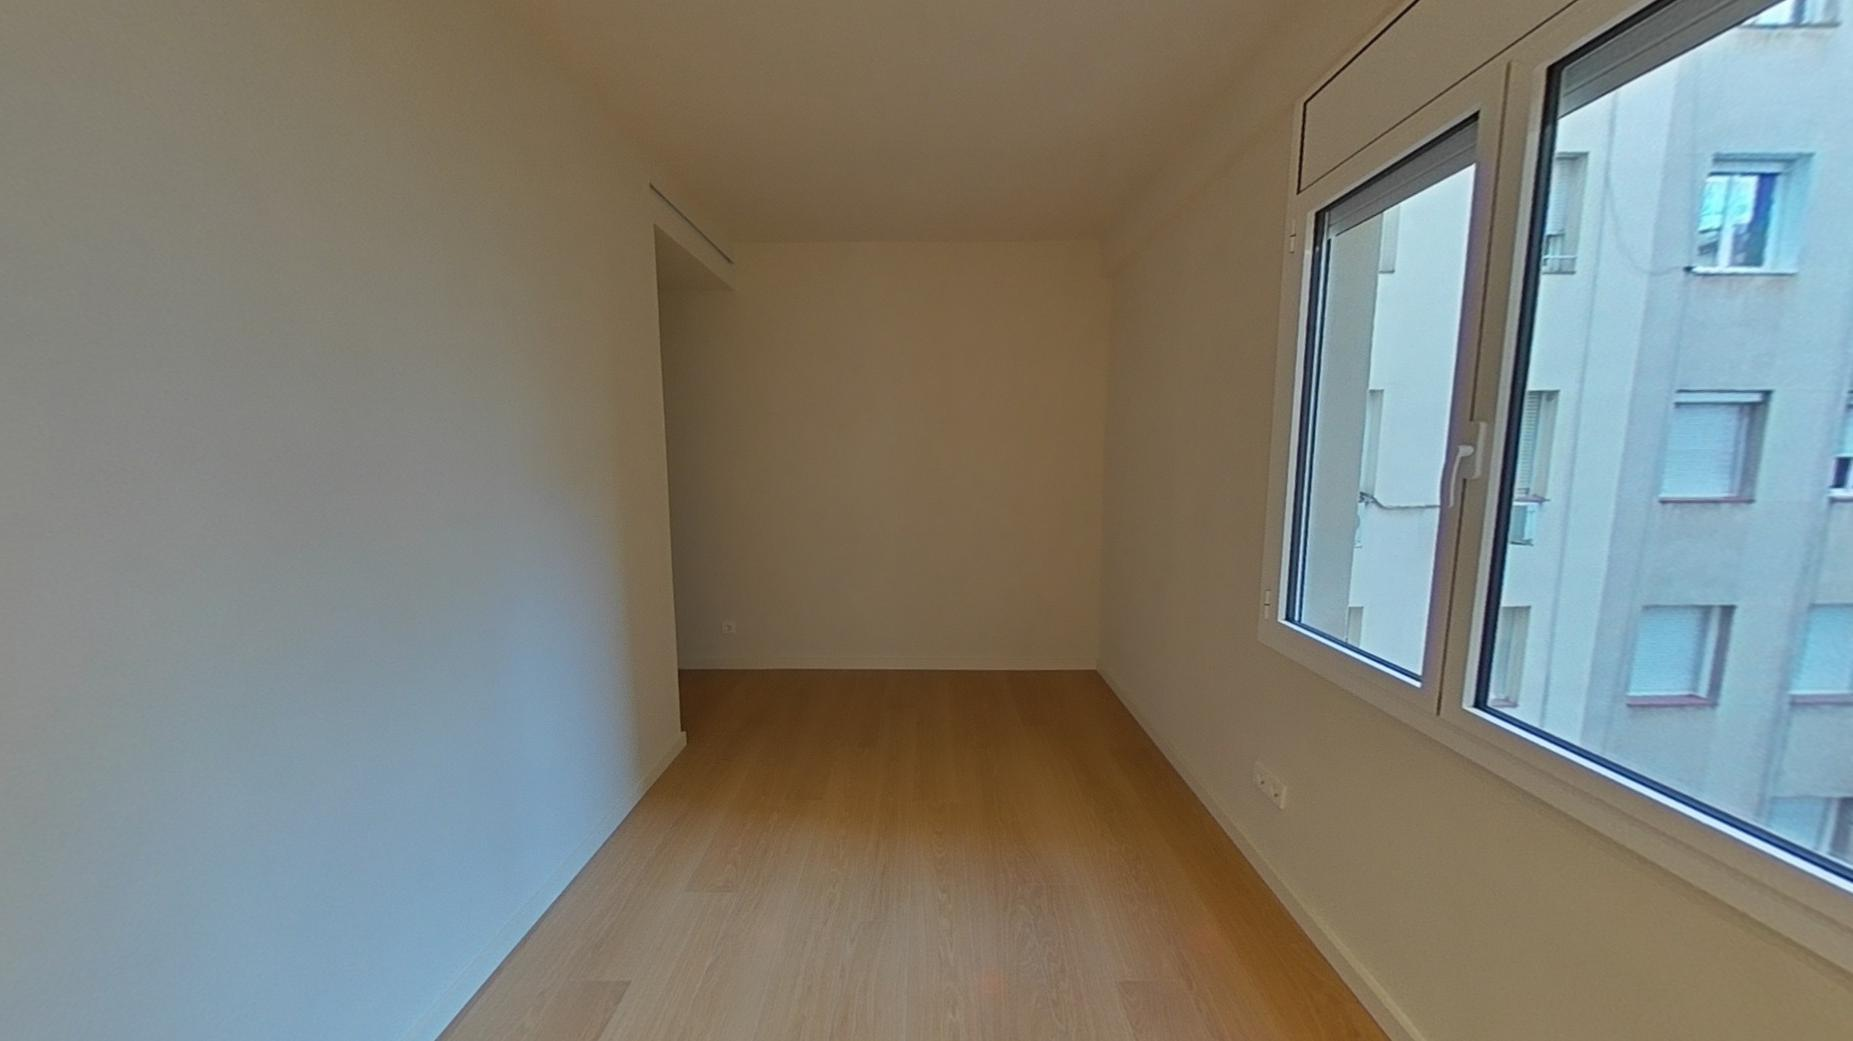 253492 Flat for sale in Sarrià-Sant Gervasi, Sant Gervasi-Galvany 36